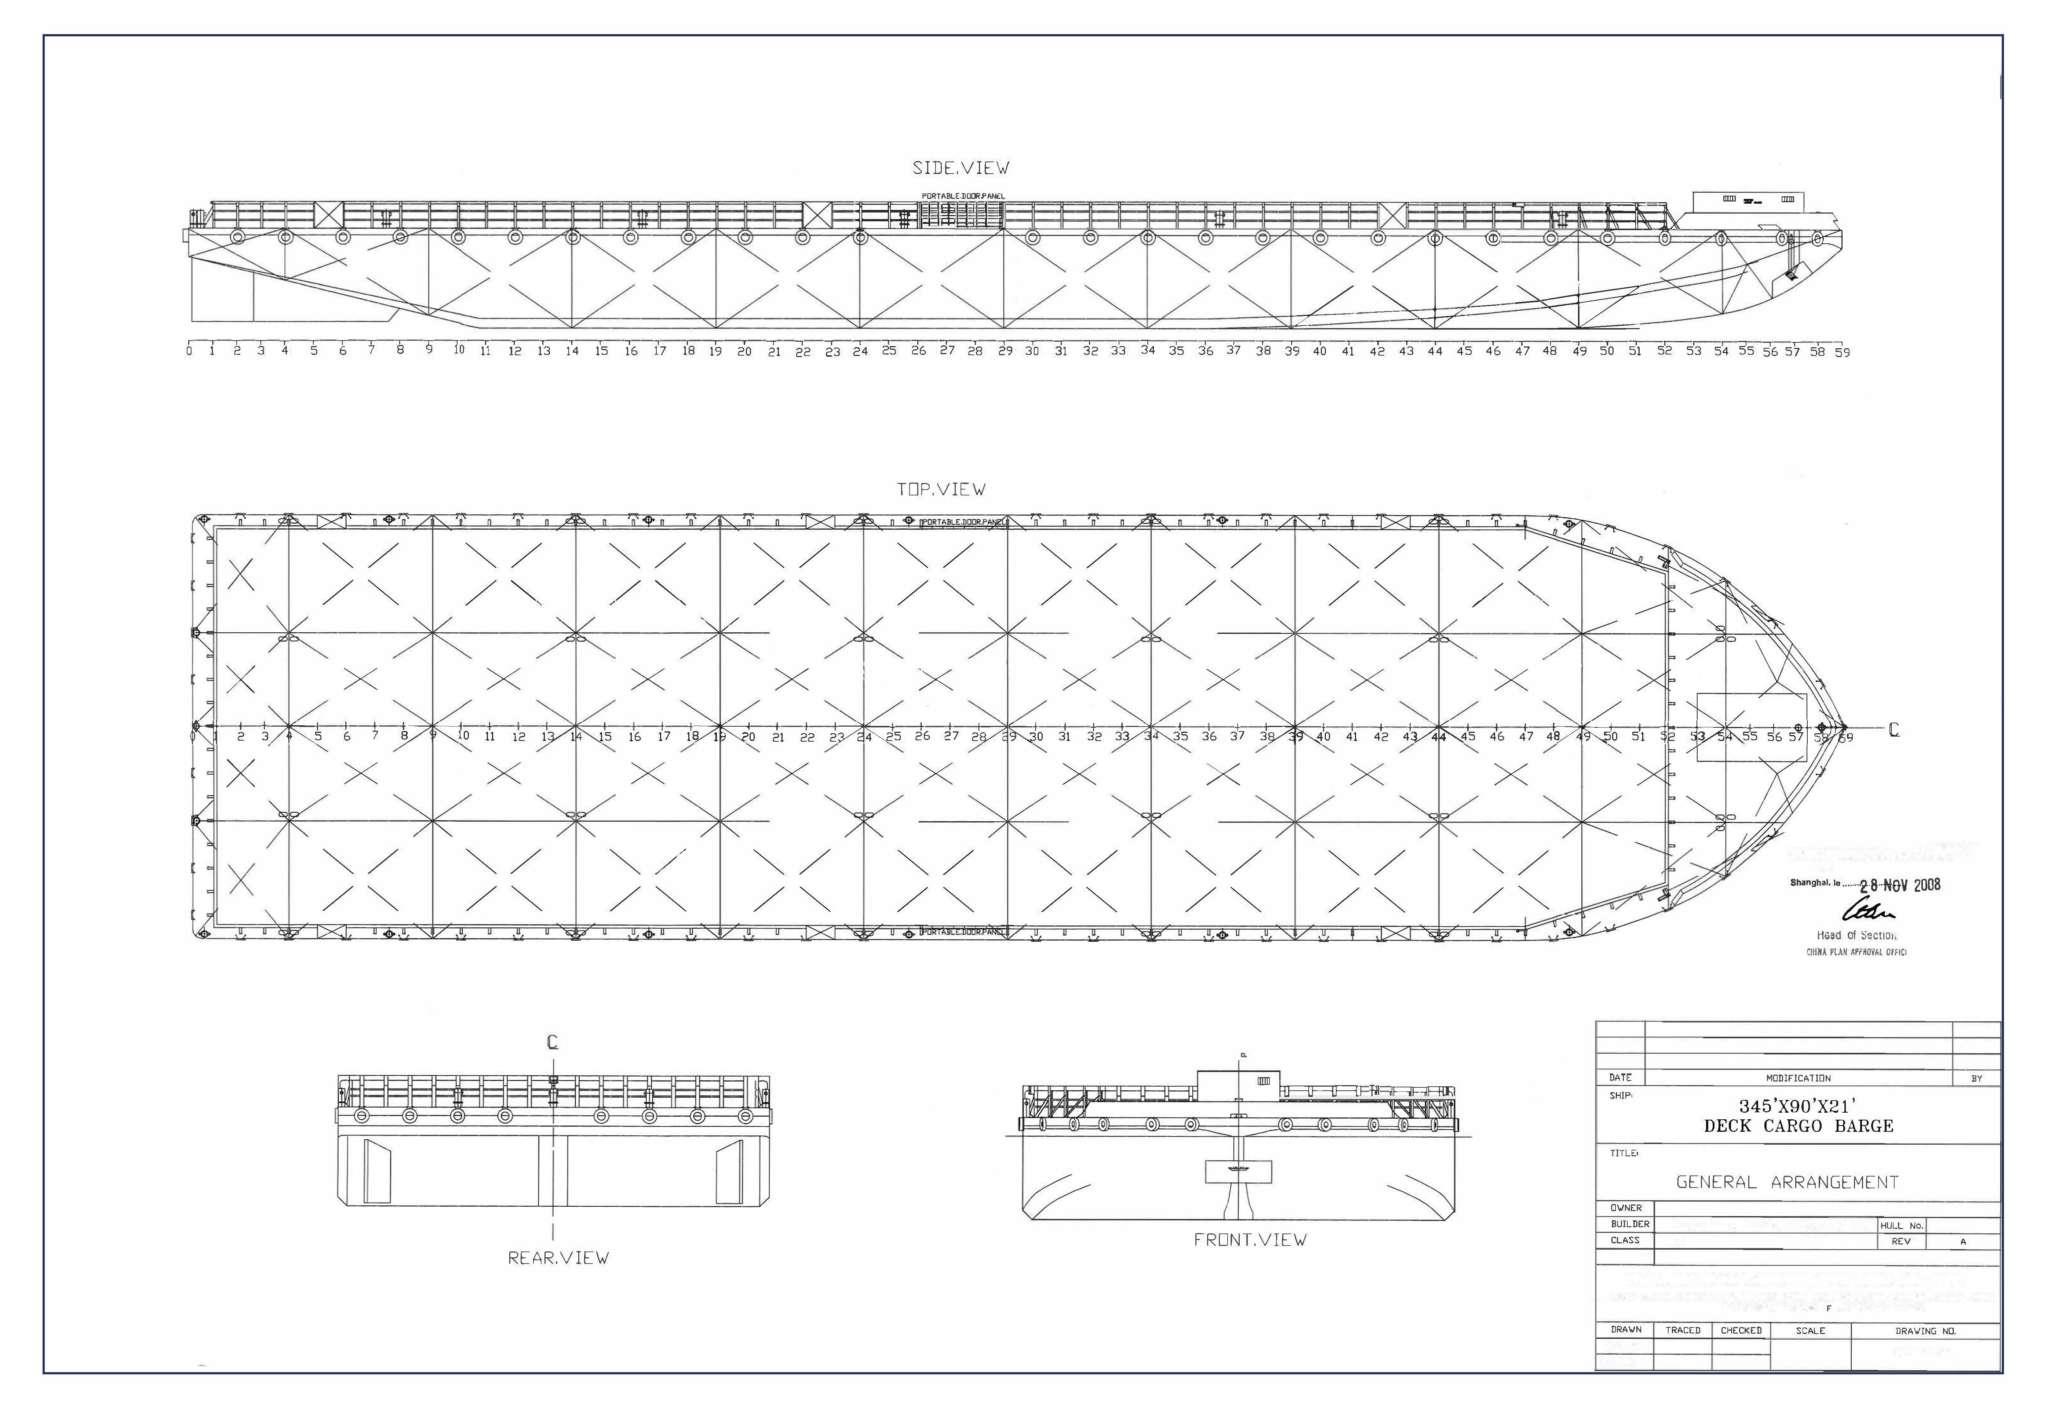 345 feet Deck Cargo Barge